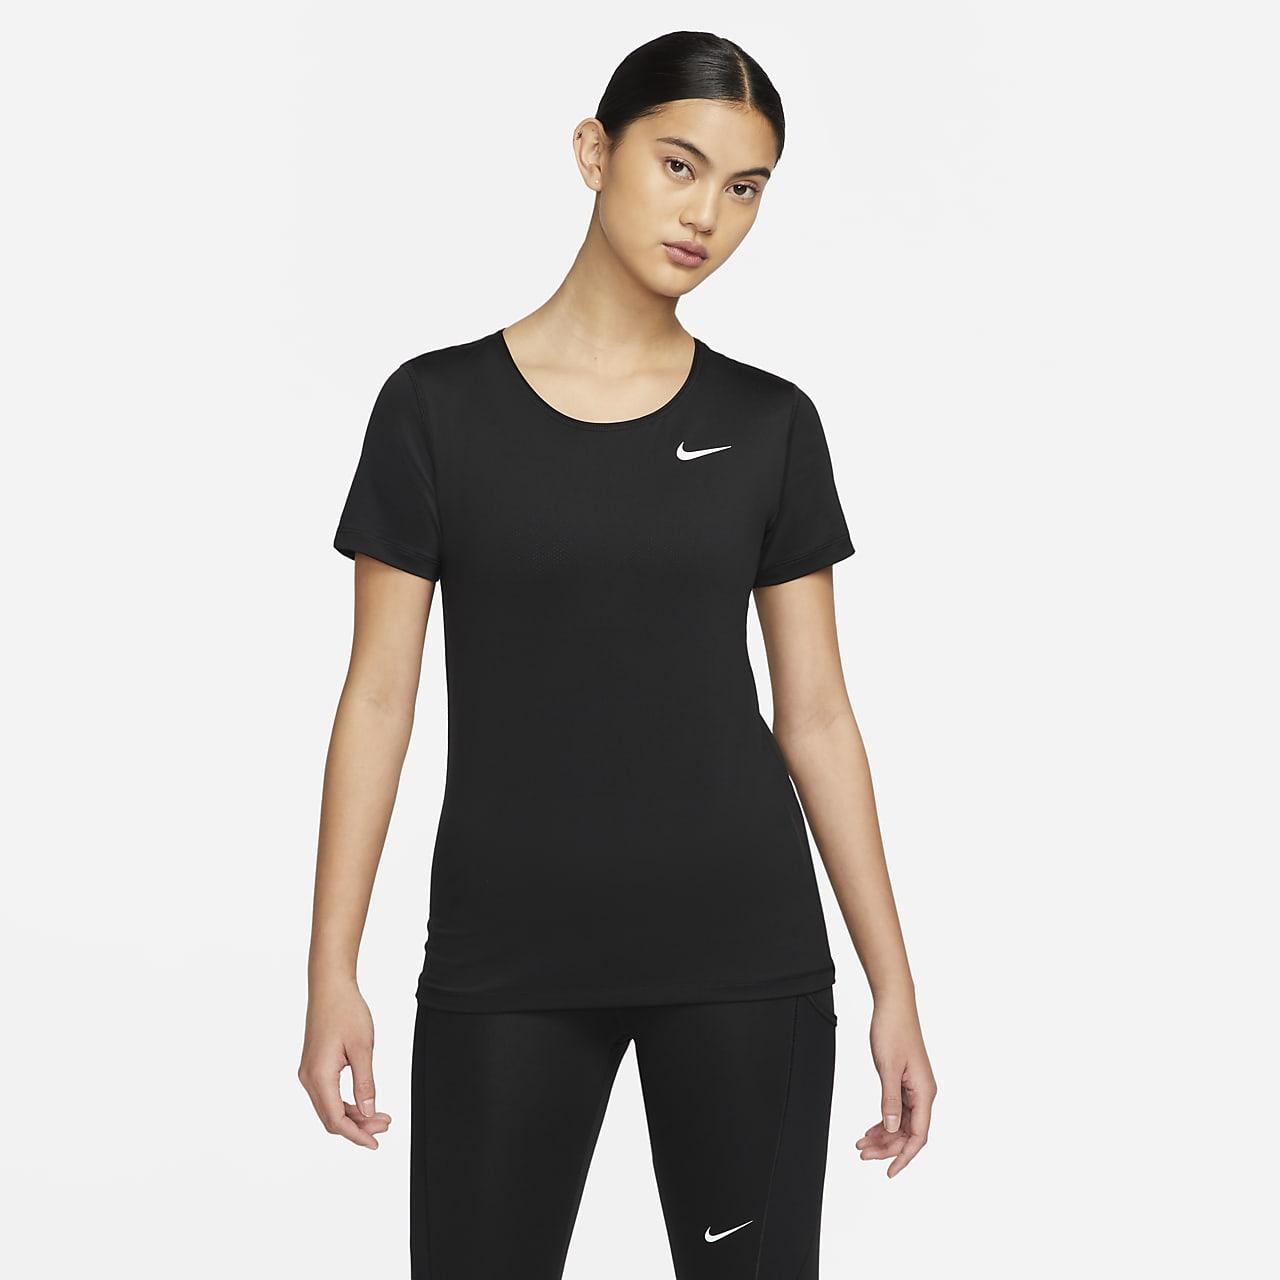 808683c3f955 Nike Pro Women s Short-Sleeve Training Top. Nike.com GB